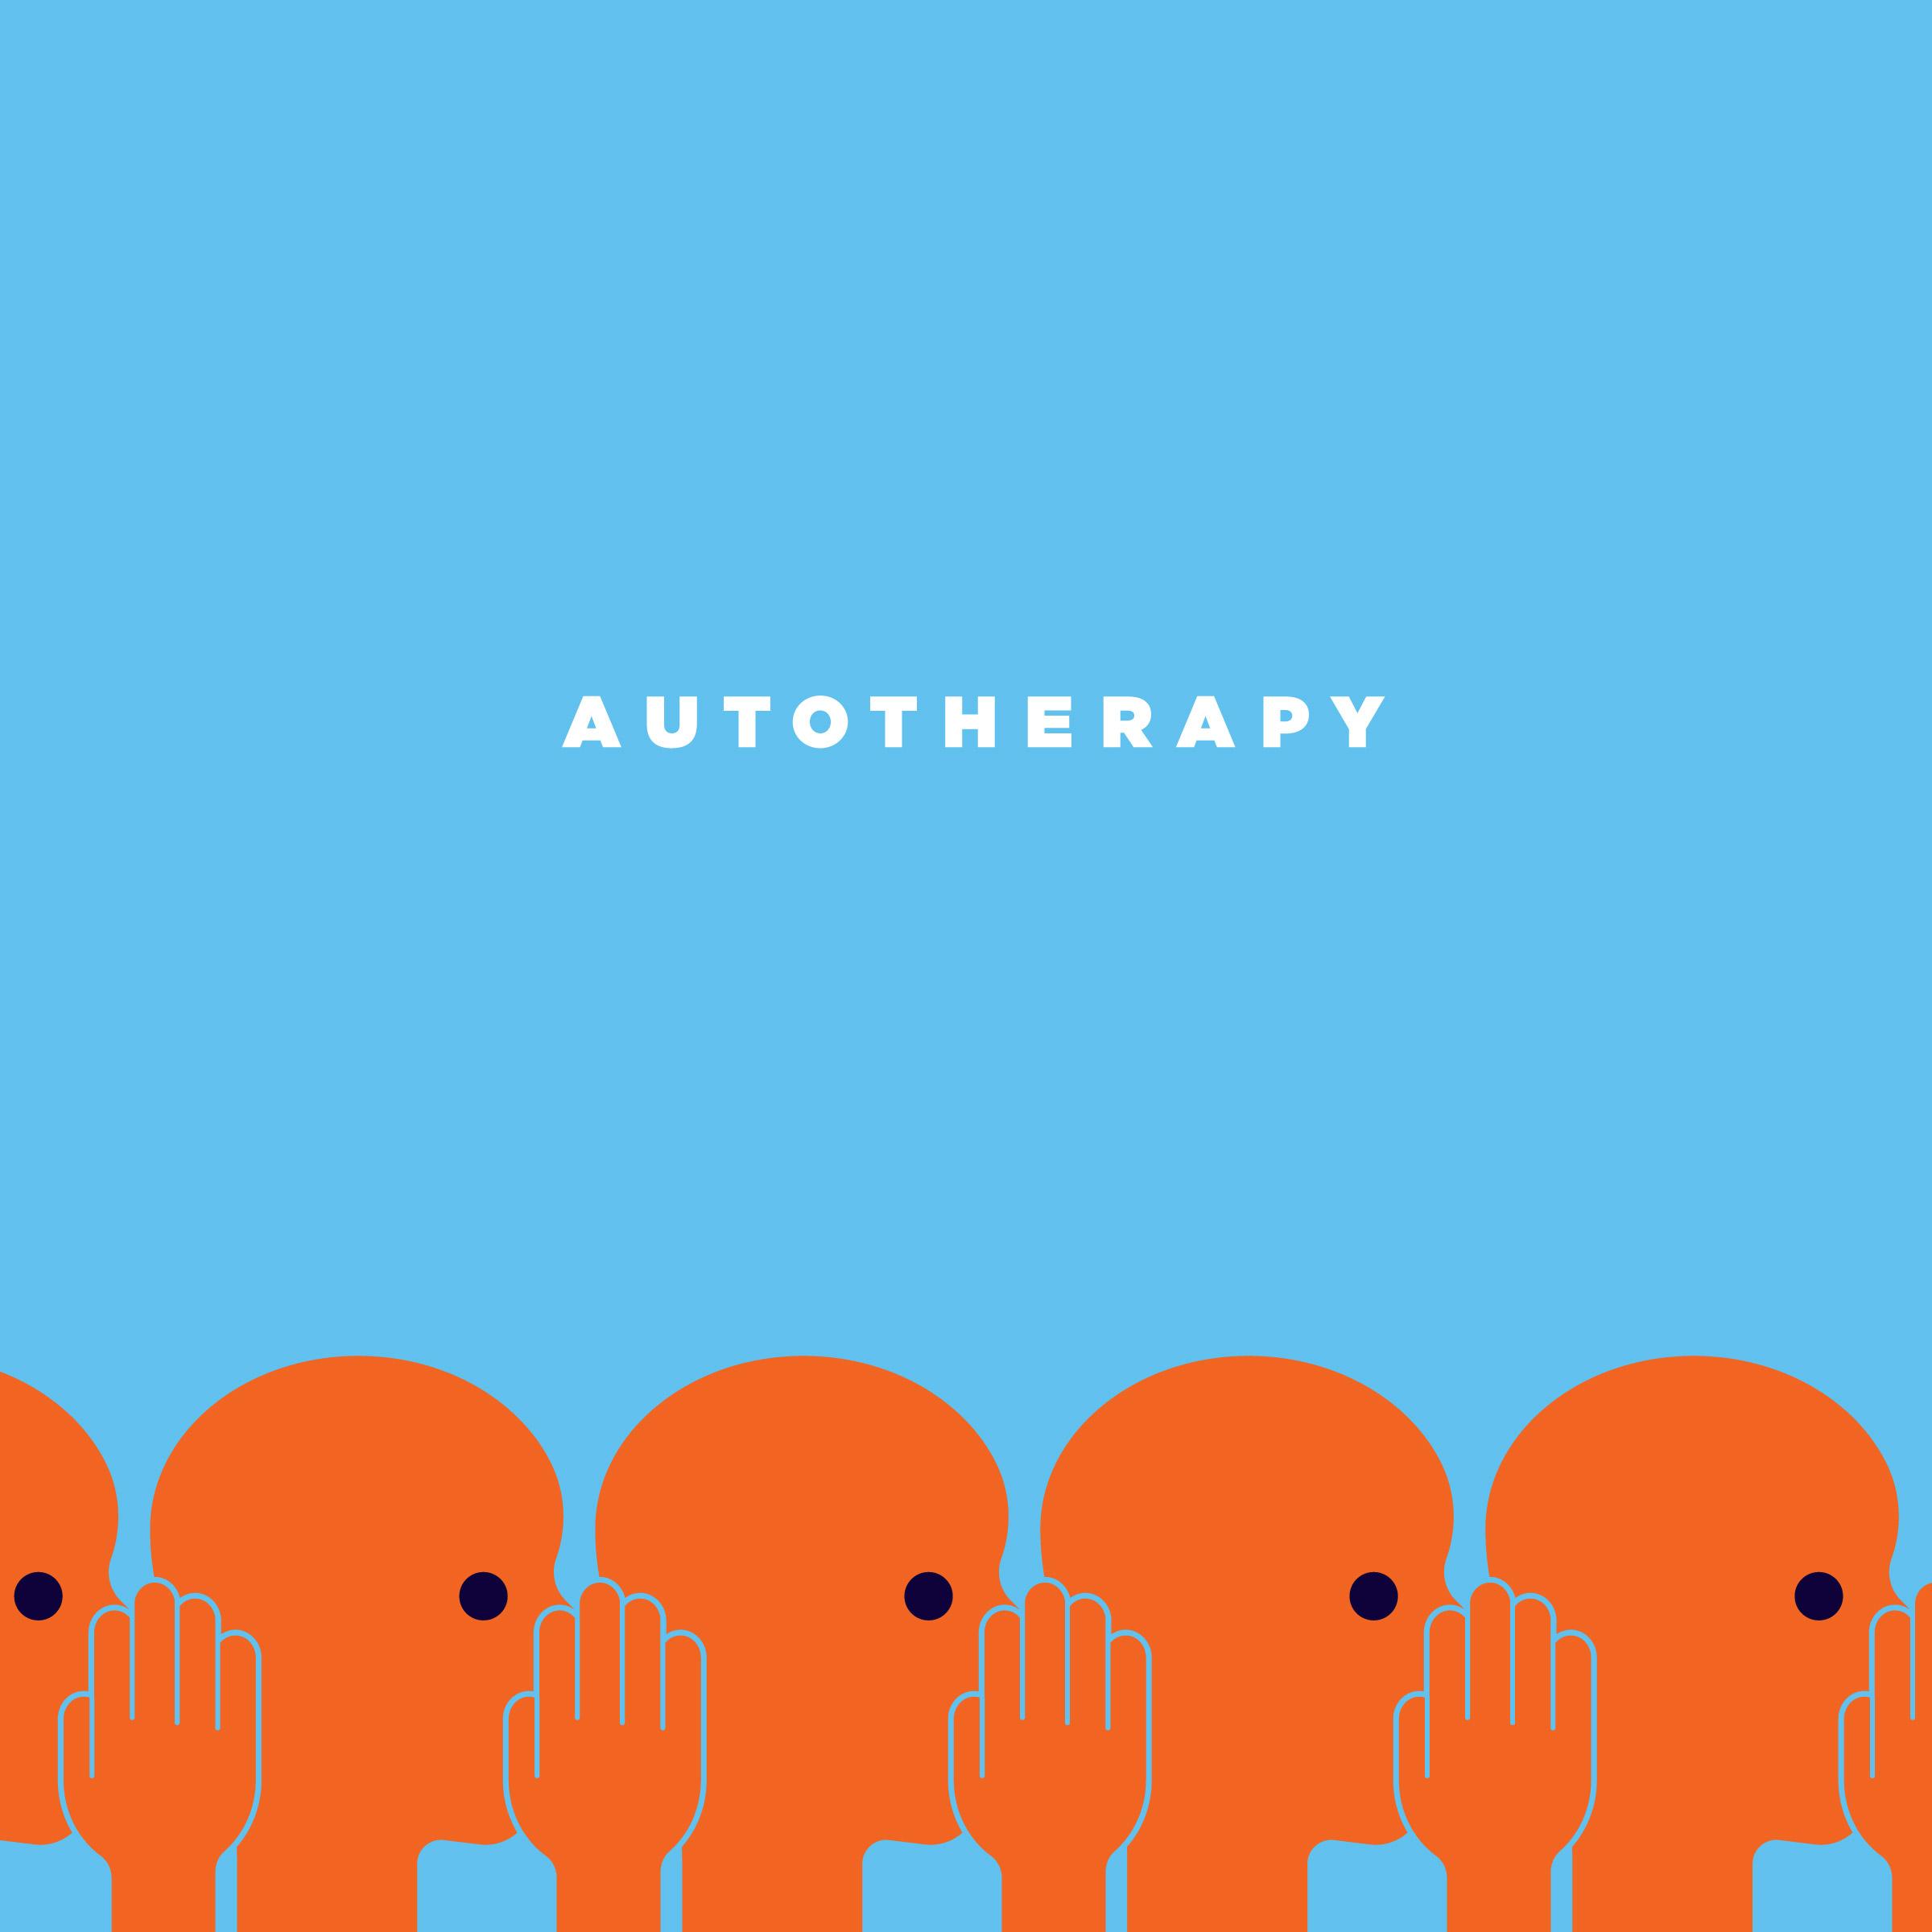 pseudodudoAutotherapy.jpg